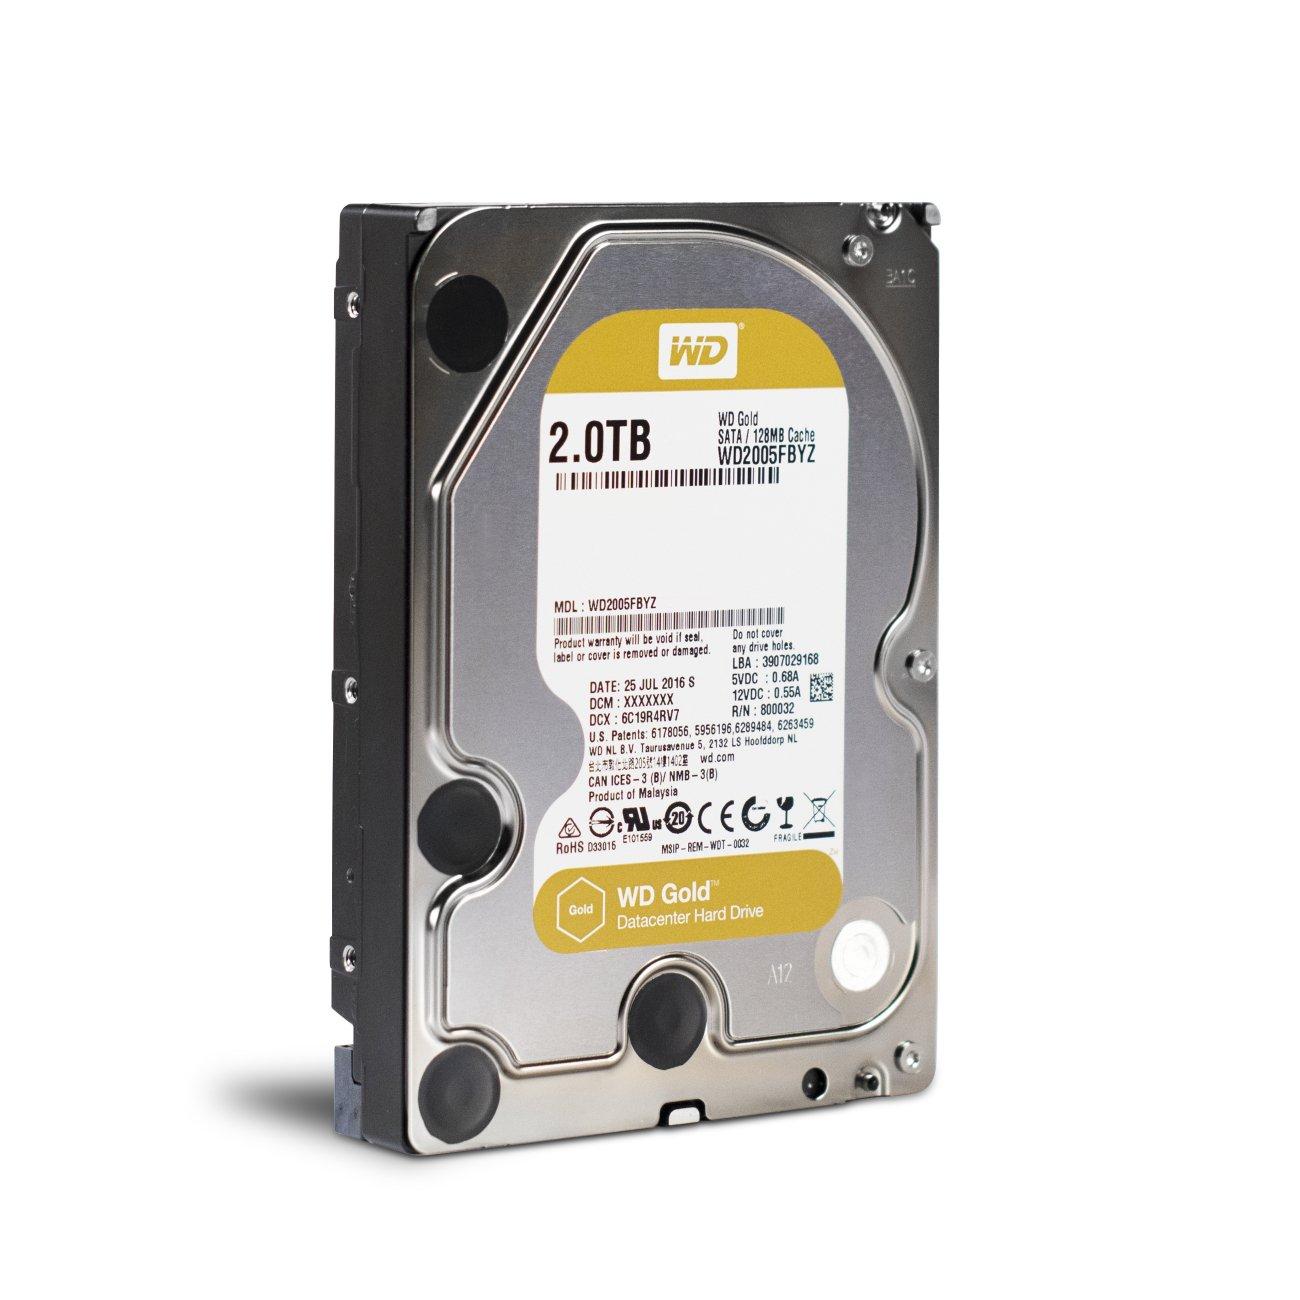 WD Gold 2TB Enterprise Class Hard Disk Drive - 7200 RPM Class SATA 6 Gb/s 128MB Cache 3.5 Inch - WD2005FBYZ by Western Digital